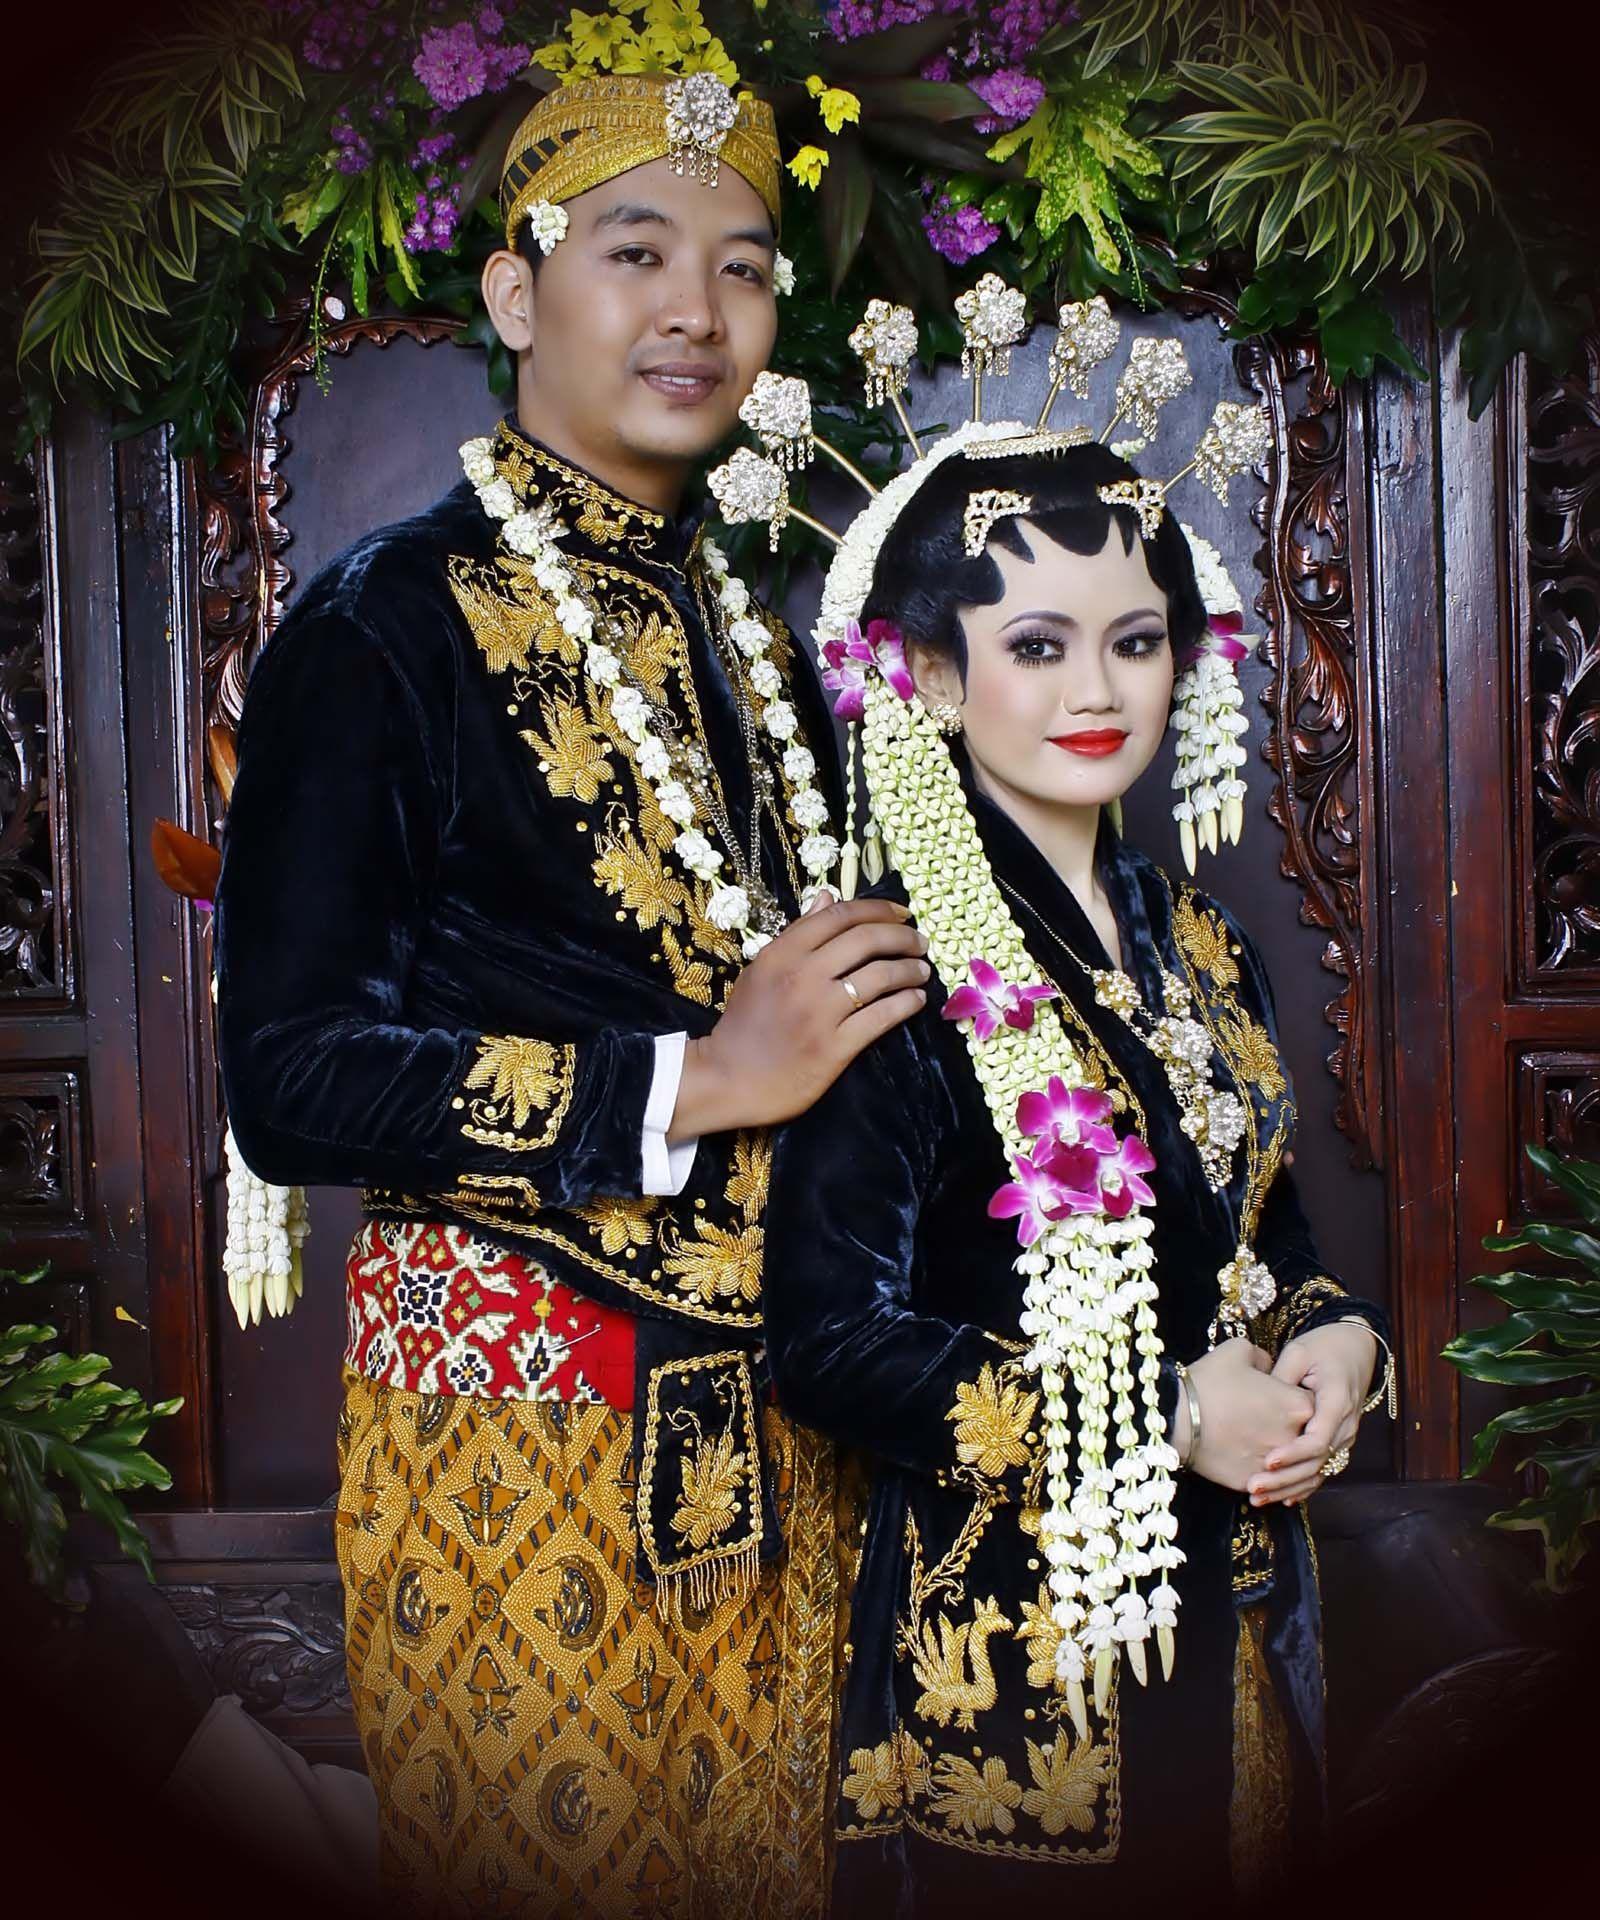 Foto Pengantin Jawa : pengantin, Model-baju-pengantin-tradisional-jawa-timur-853x1024, Model-baju-pengantin, -tradisional-jawa-timur-853x1024, Pengantin,, Pengantin